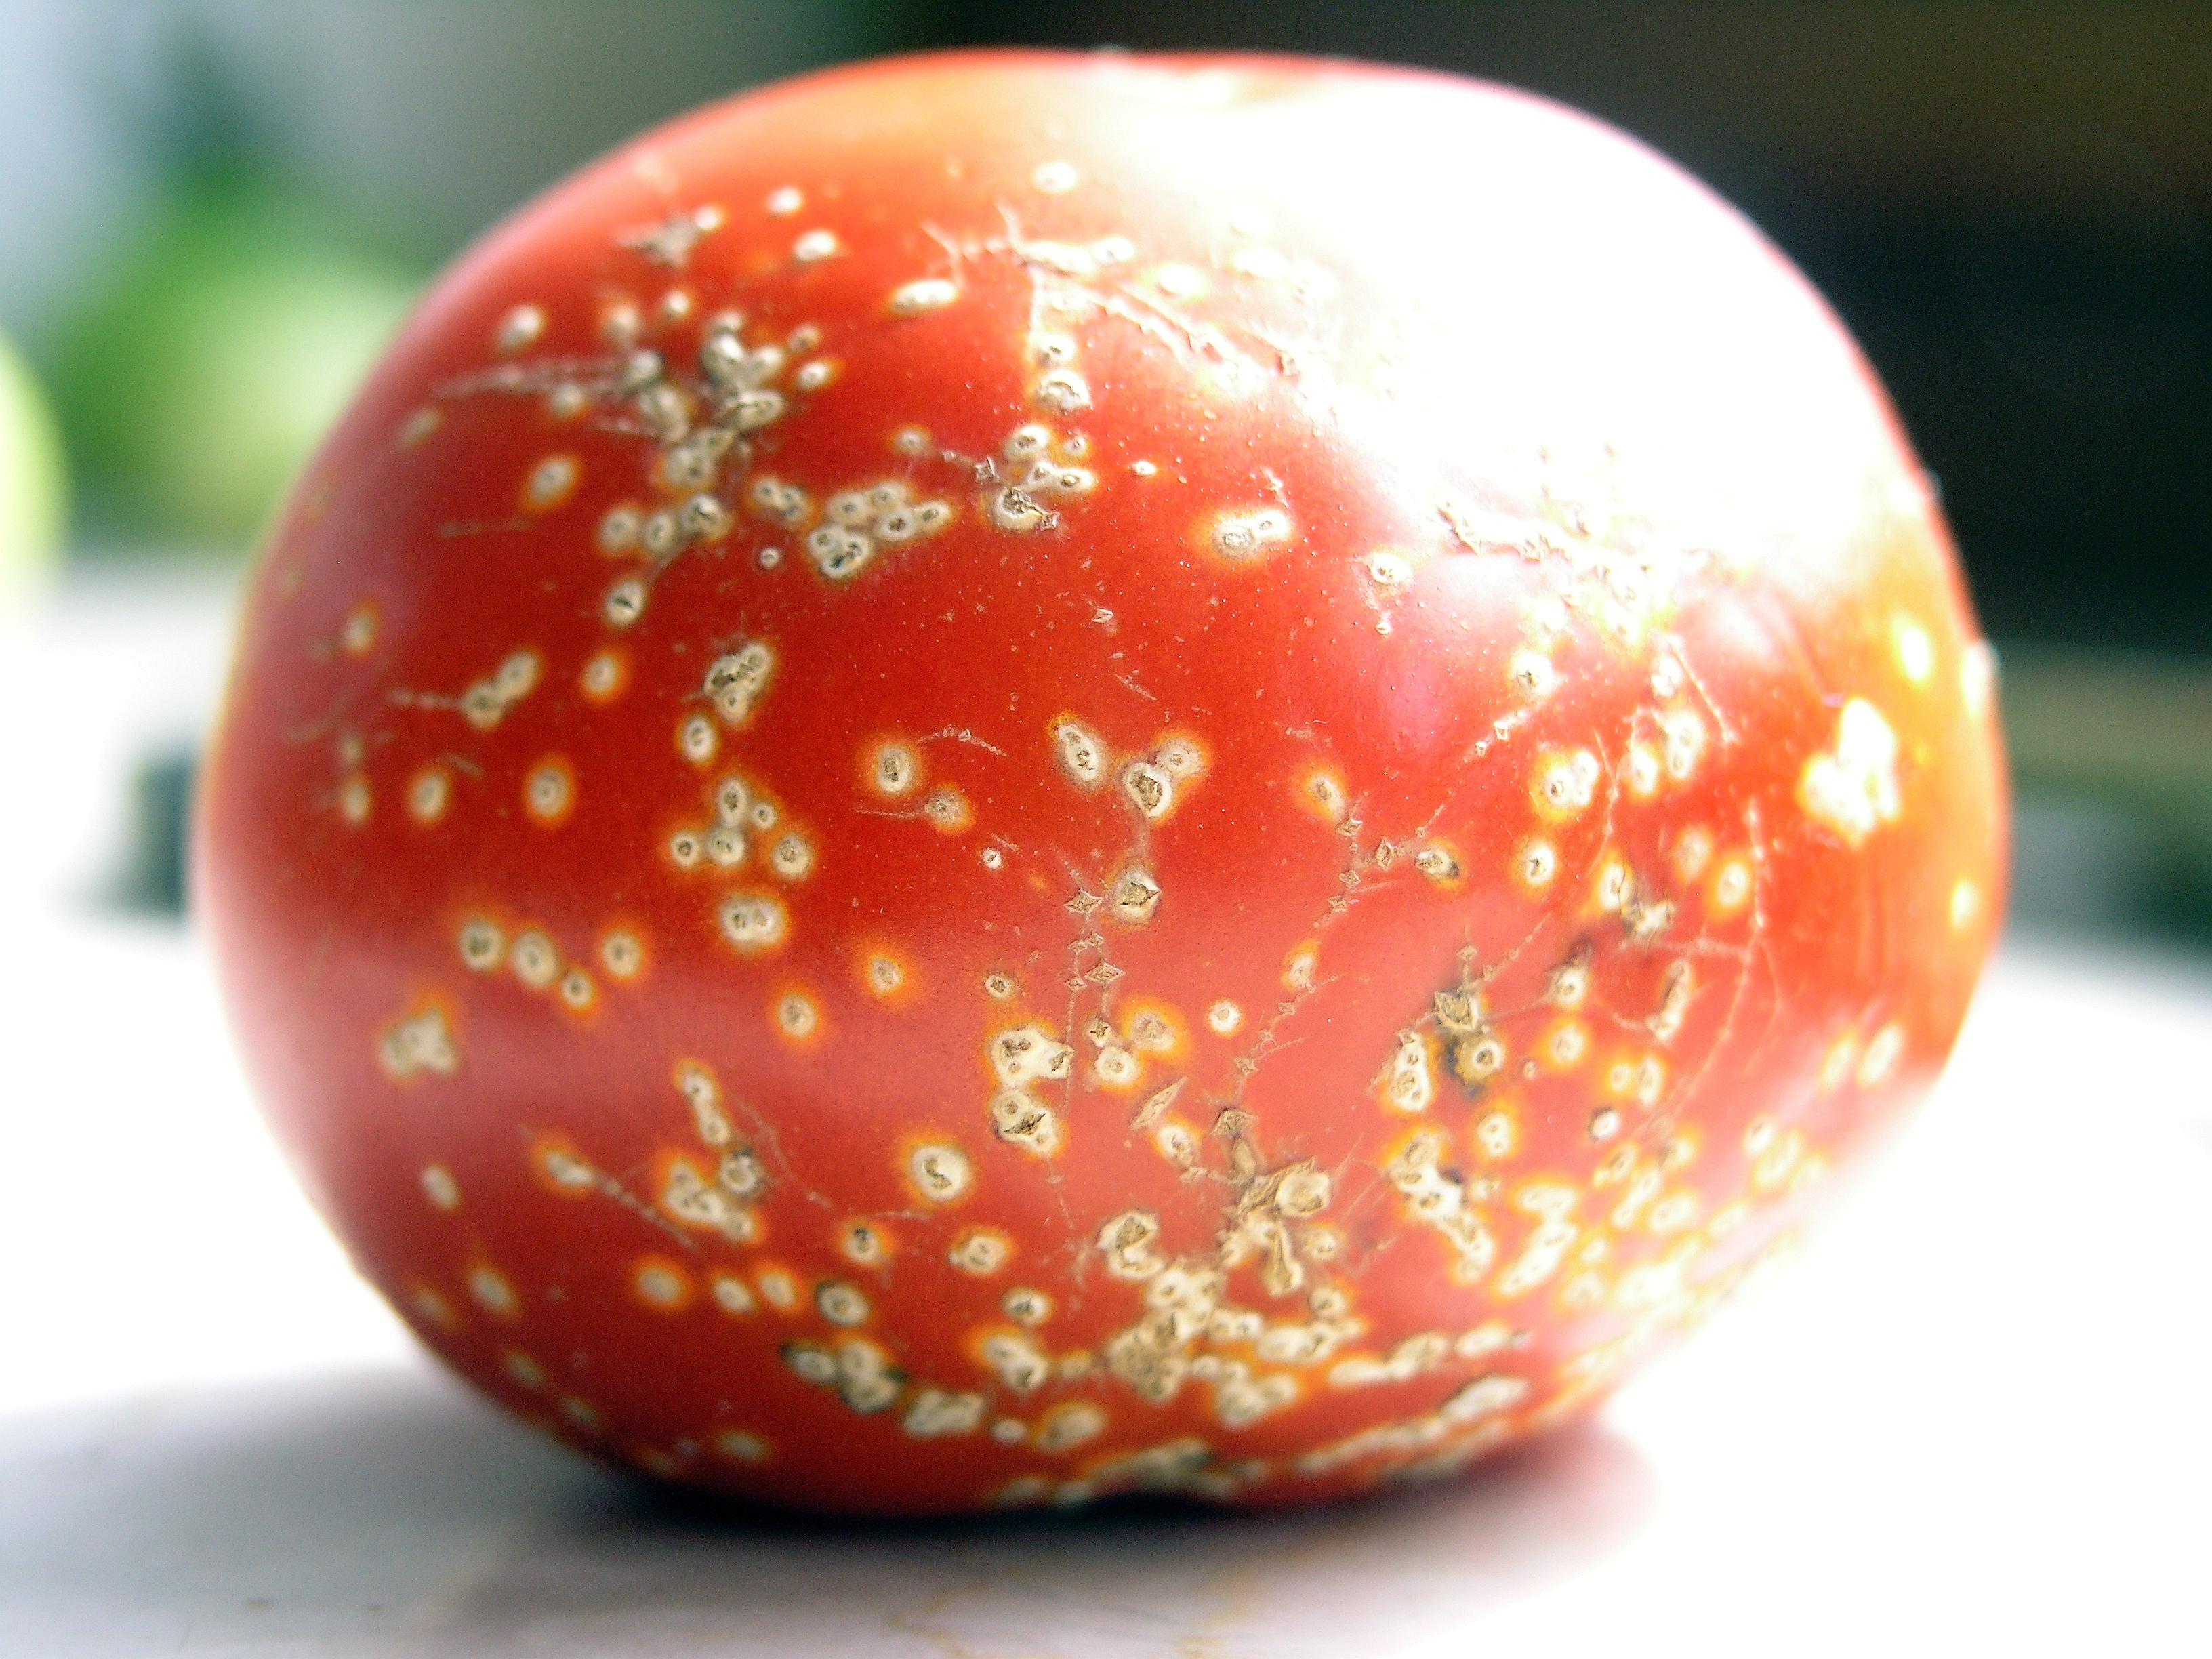 Chancre bactérien de la tomate - Wikiwand